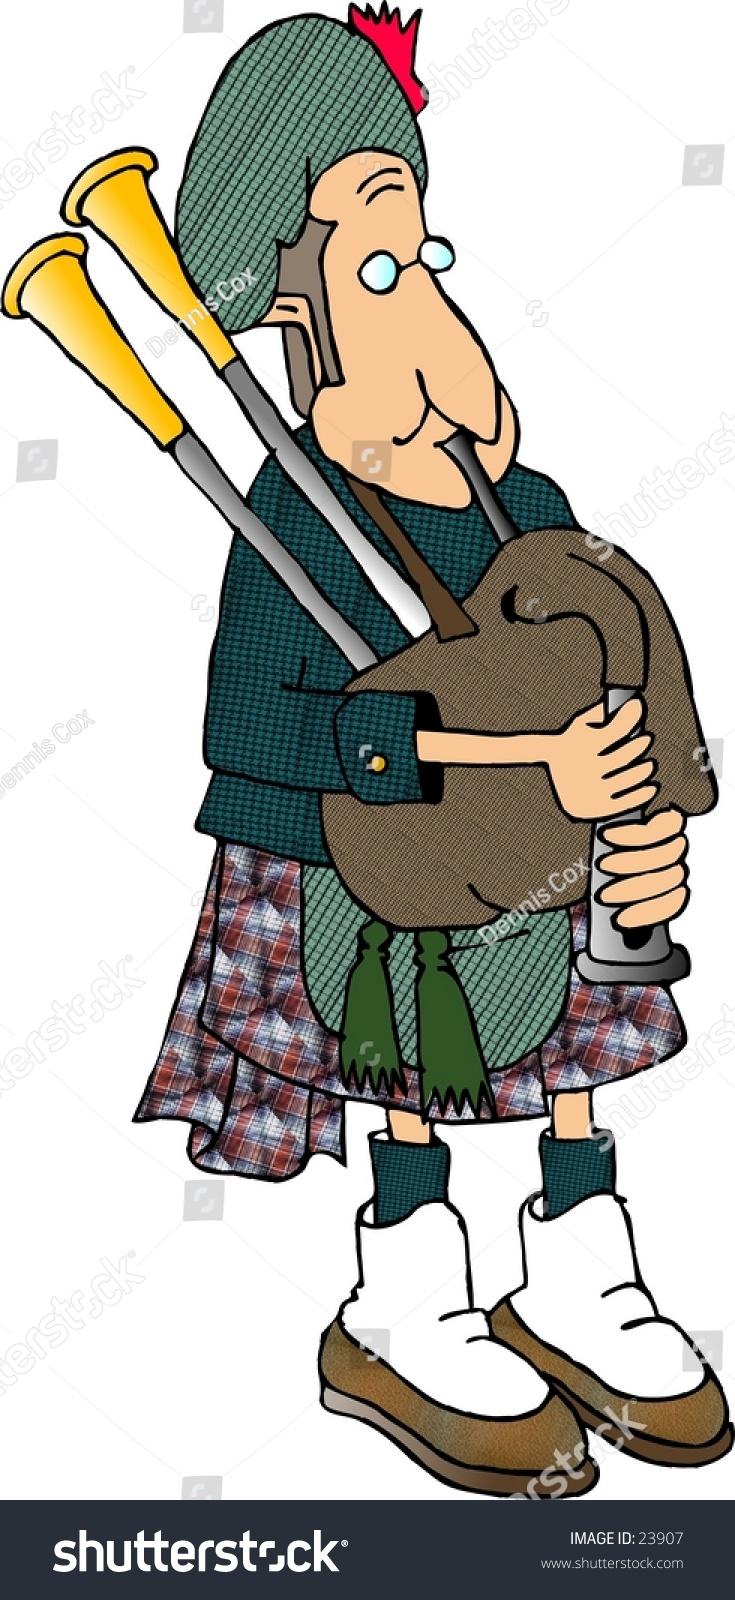 Clipart Illustration Man Traditional Scottish Attire Stock ...